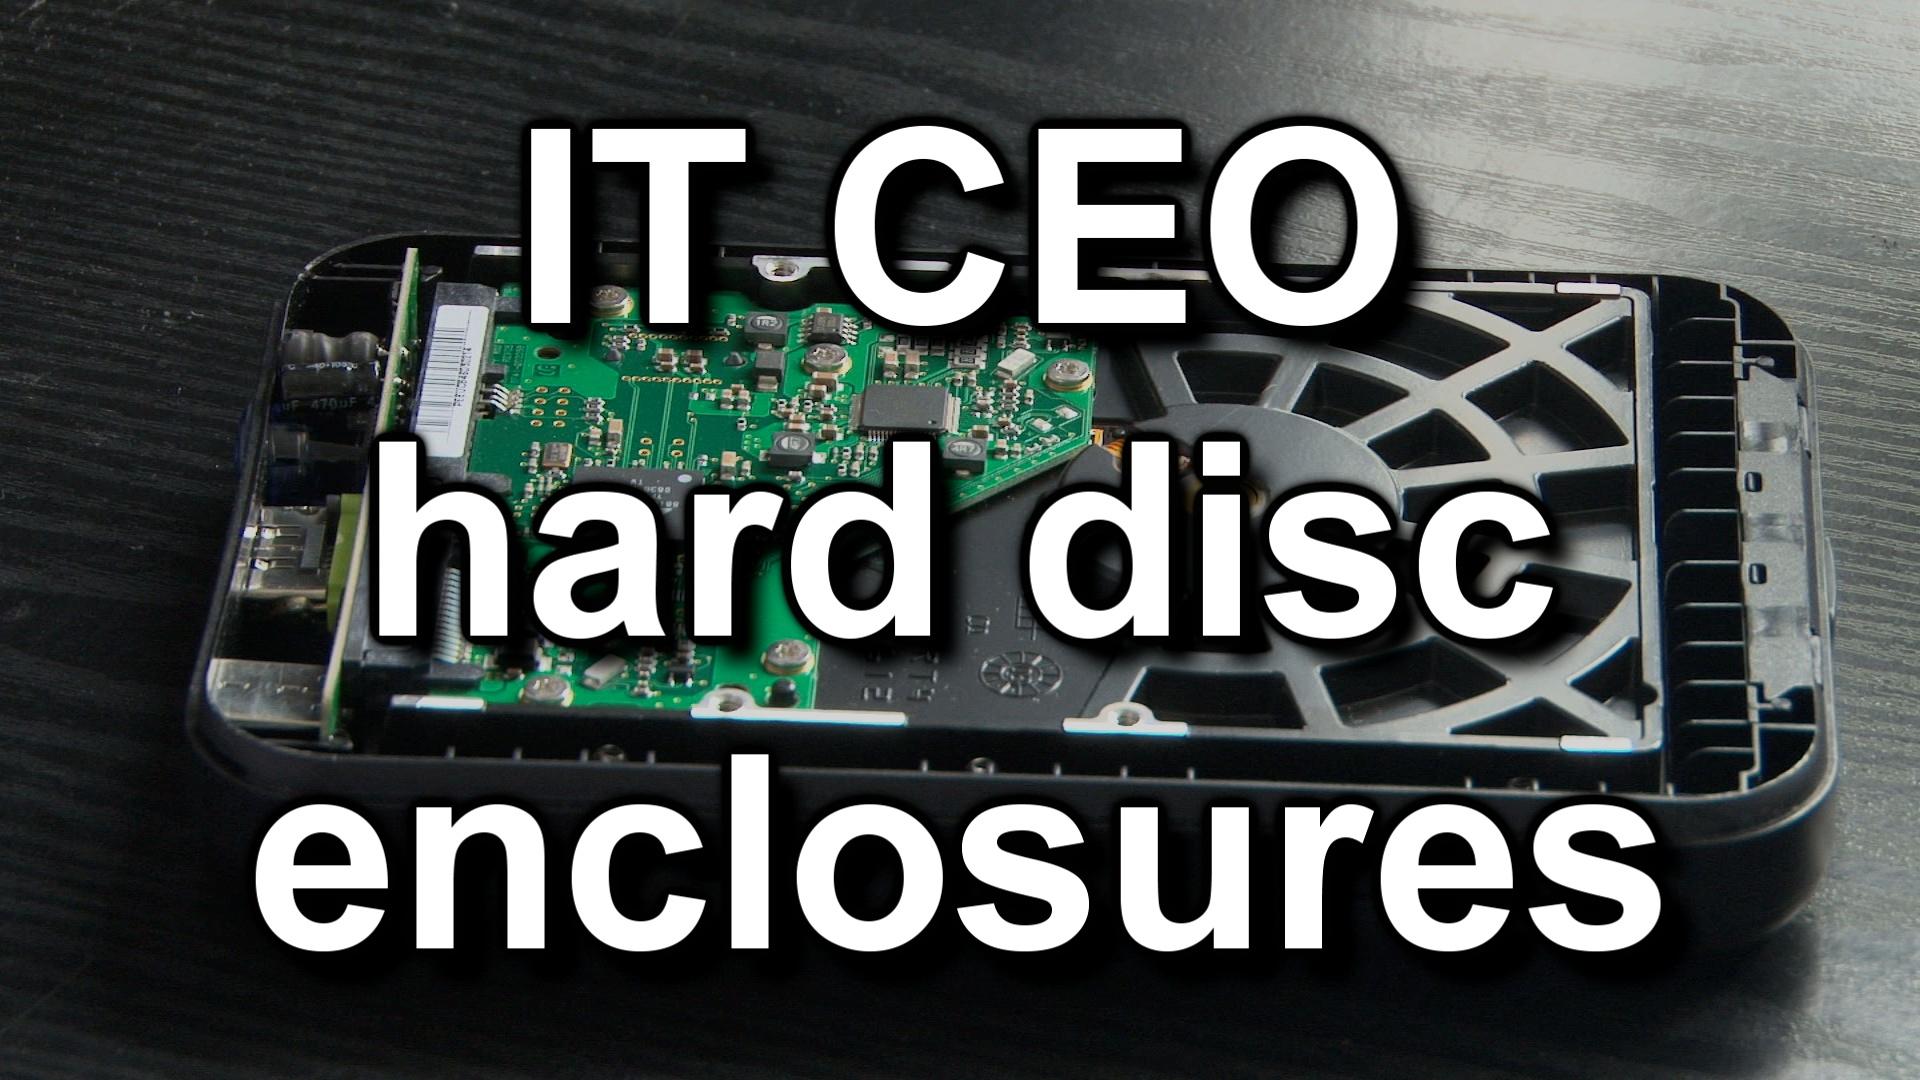 IT-CEO hard disc enclosures thumbnail